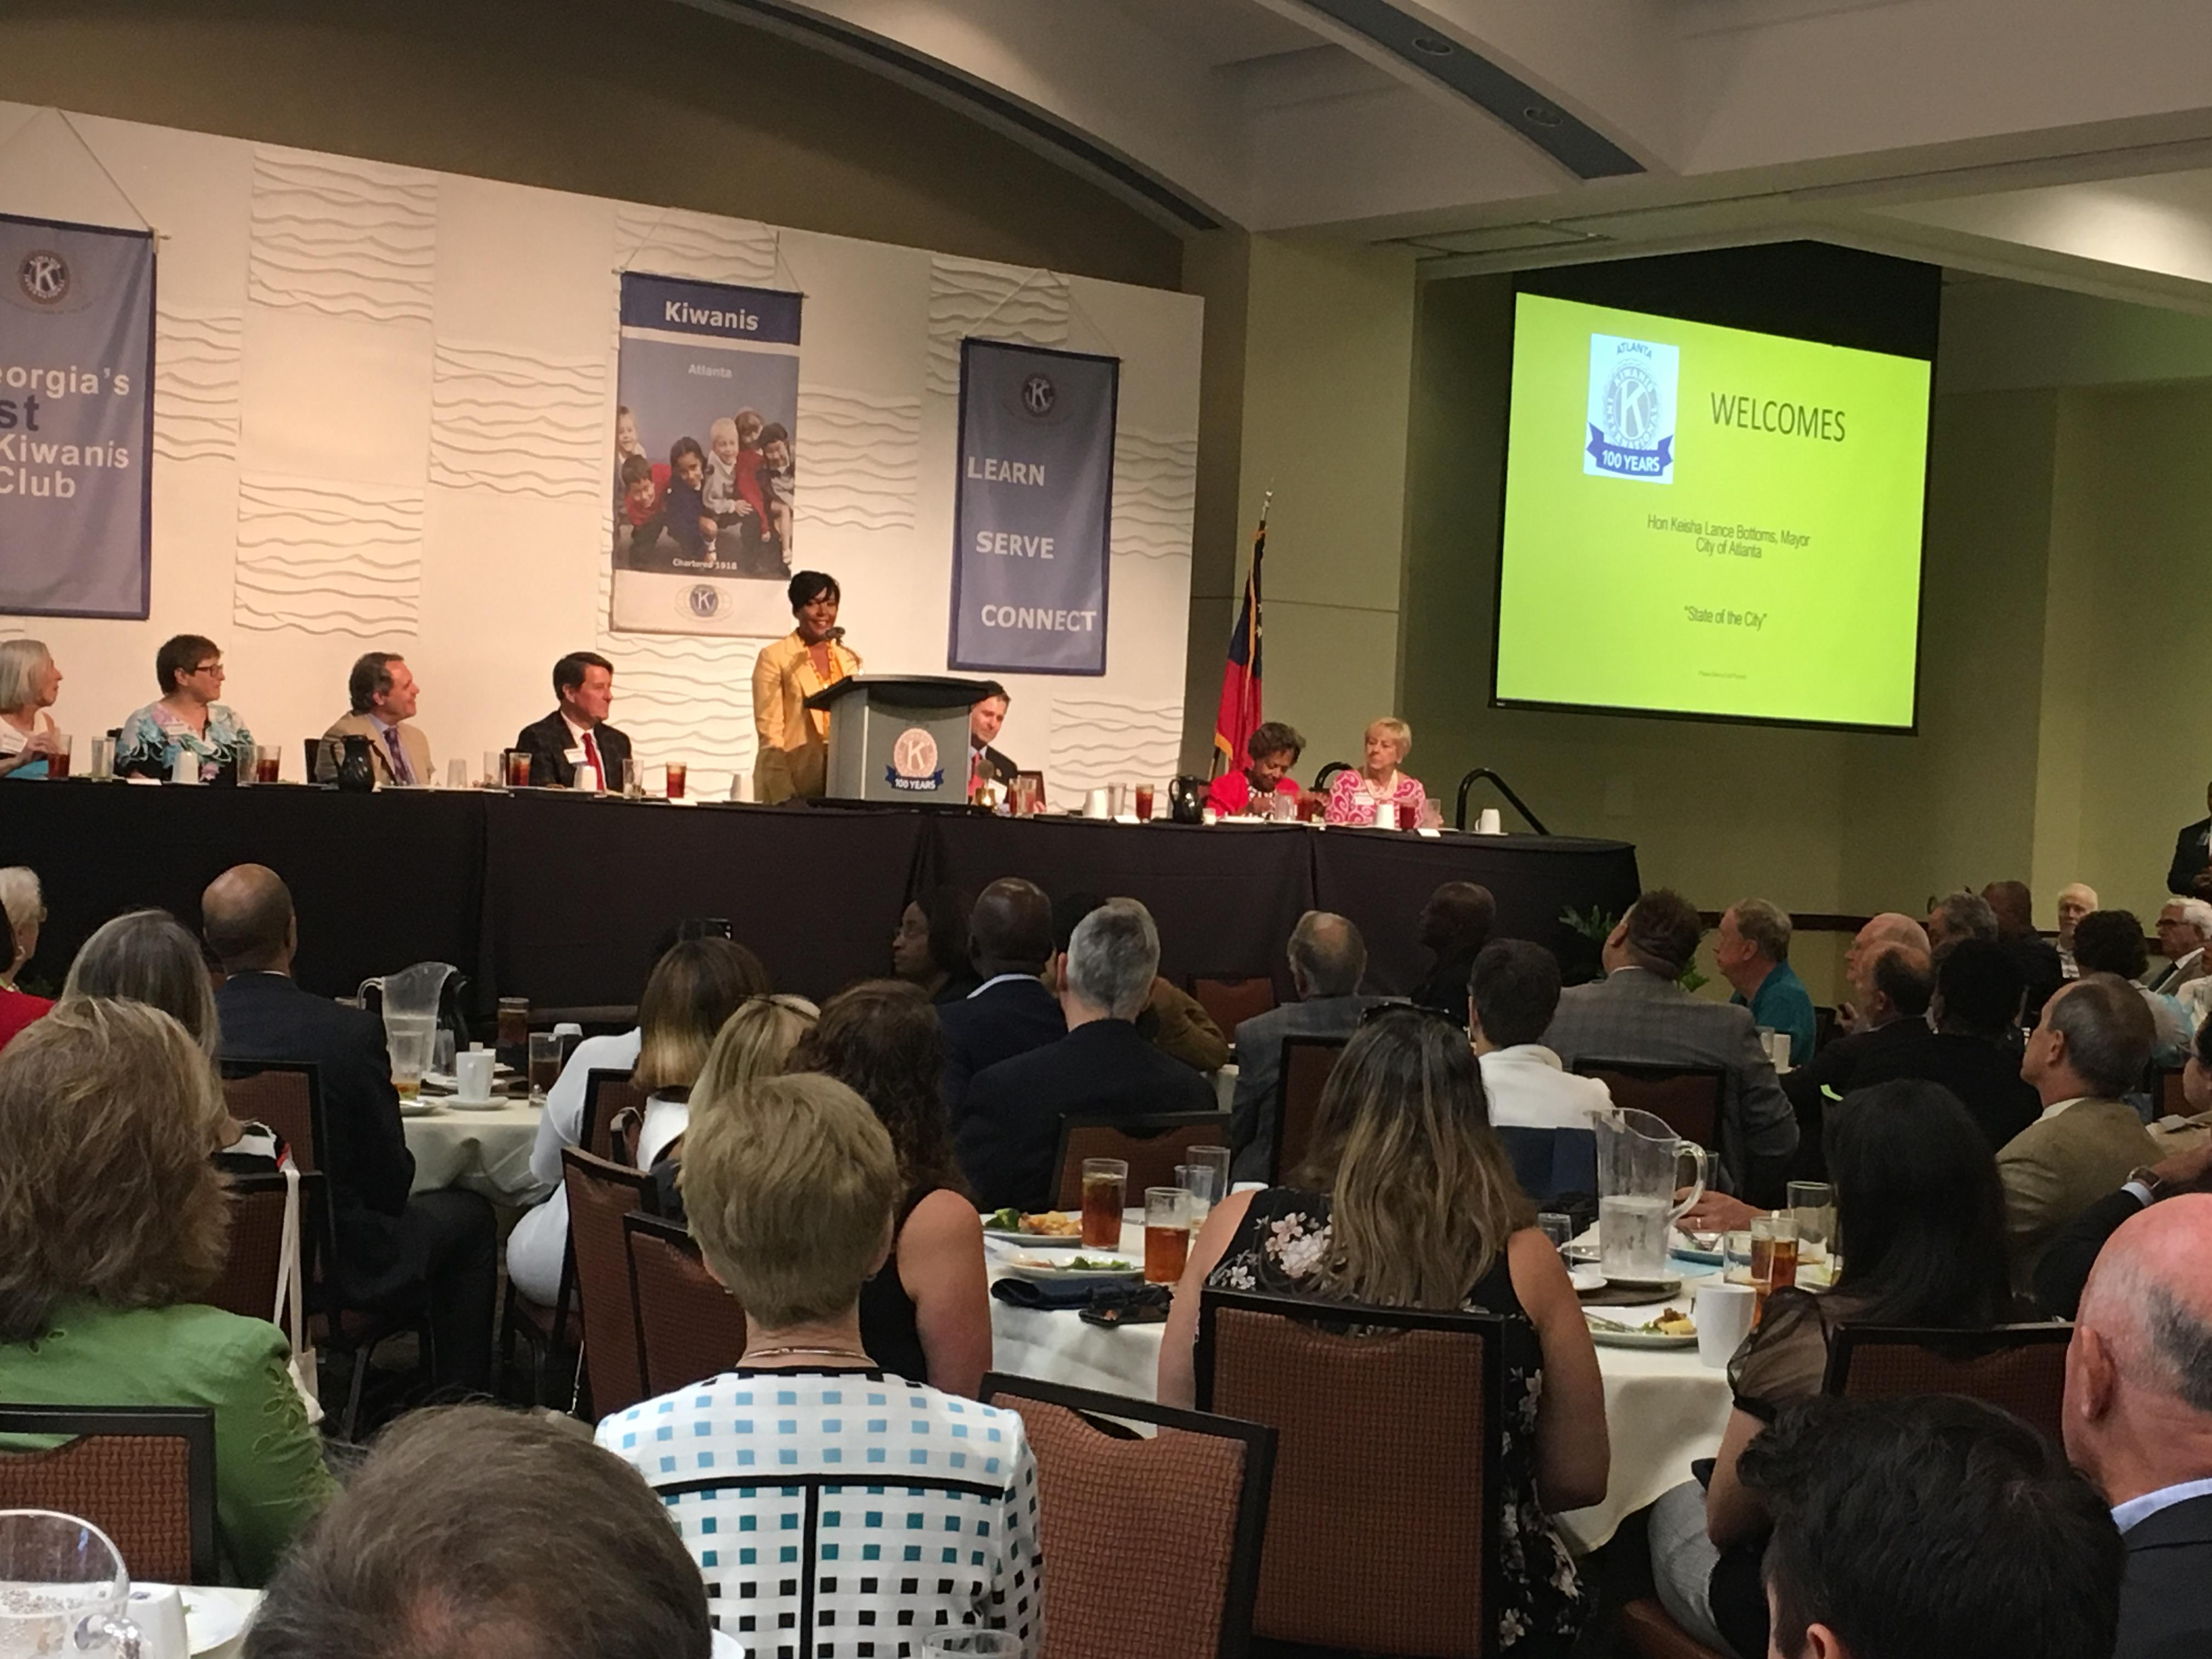 Atlanta Mayor Keisha Lance Bottoms addressing a full house of more than 200 people at the Kiwanis Club of Atlanta on Tuesday. Credit: Maggie Lee